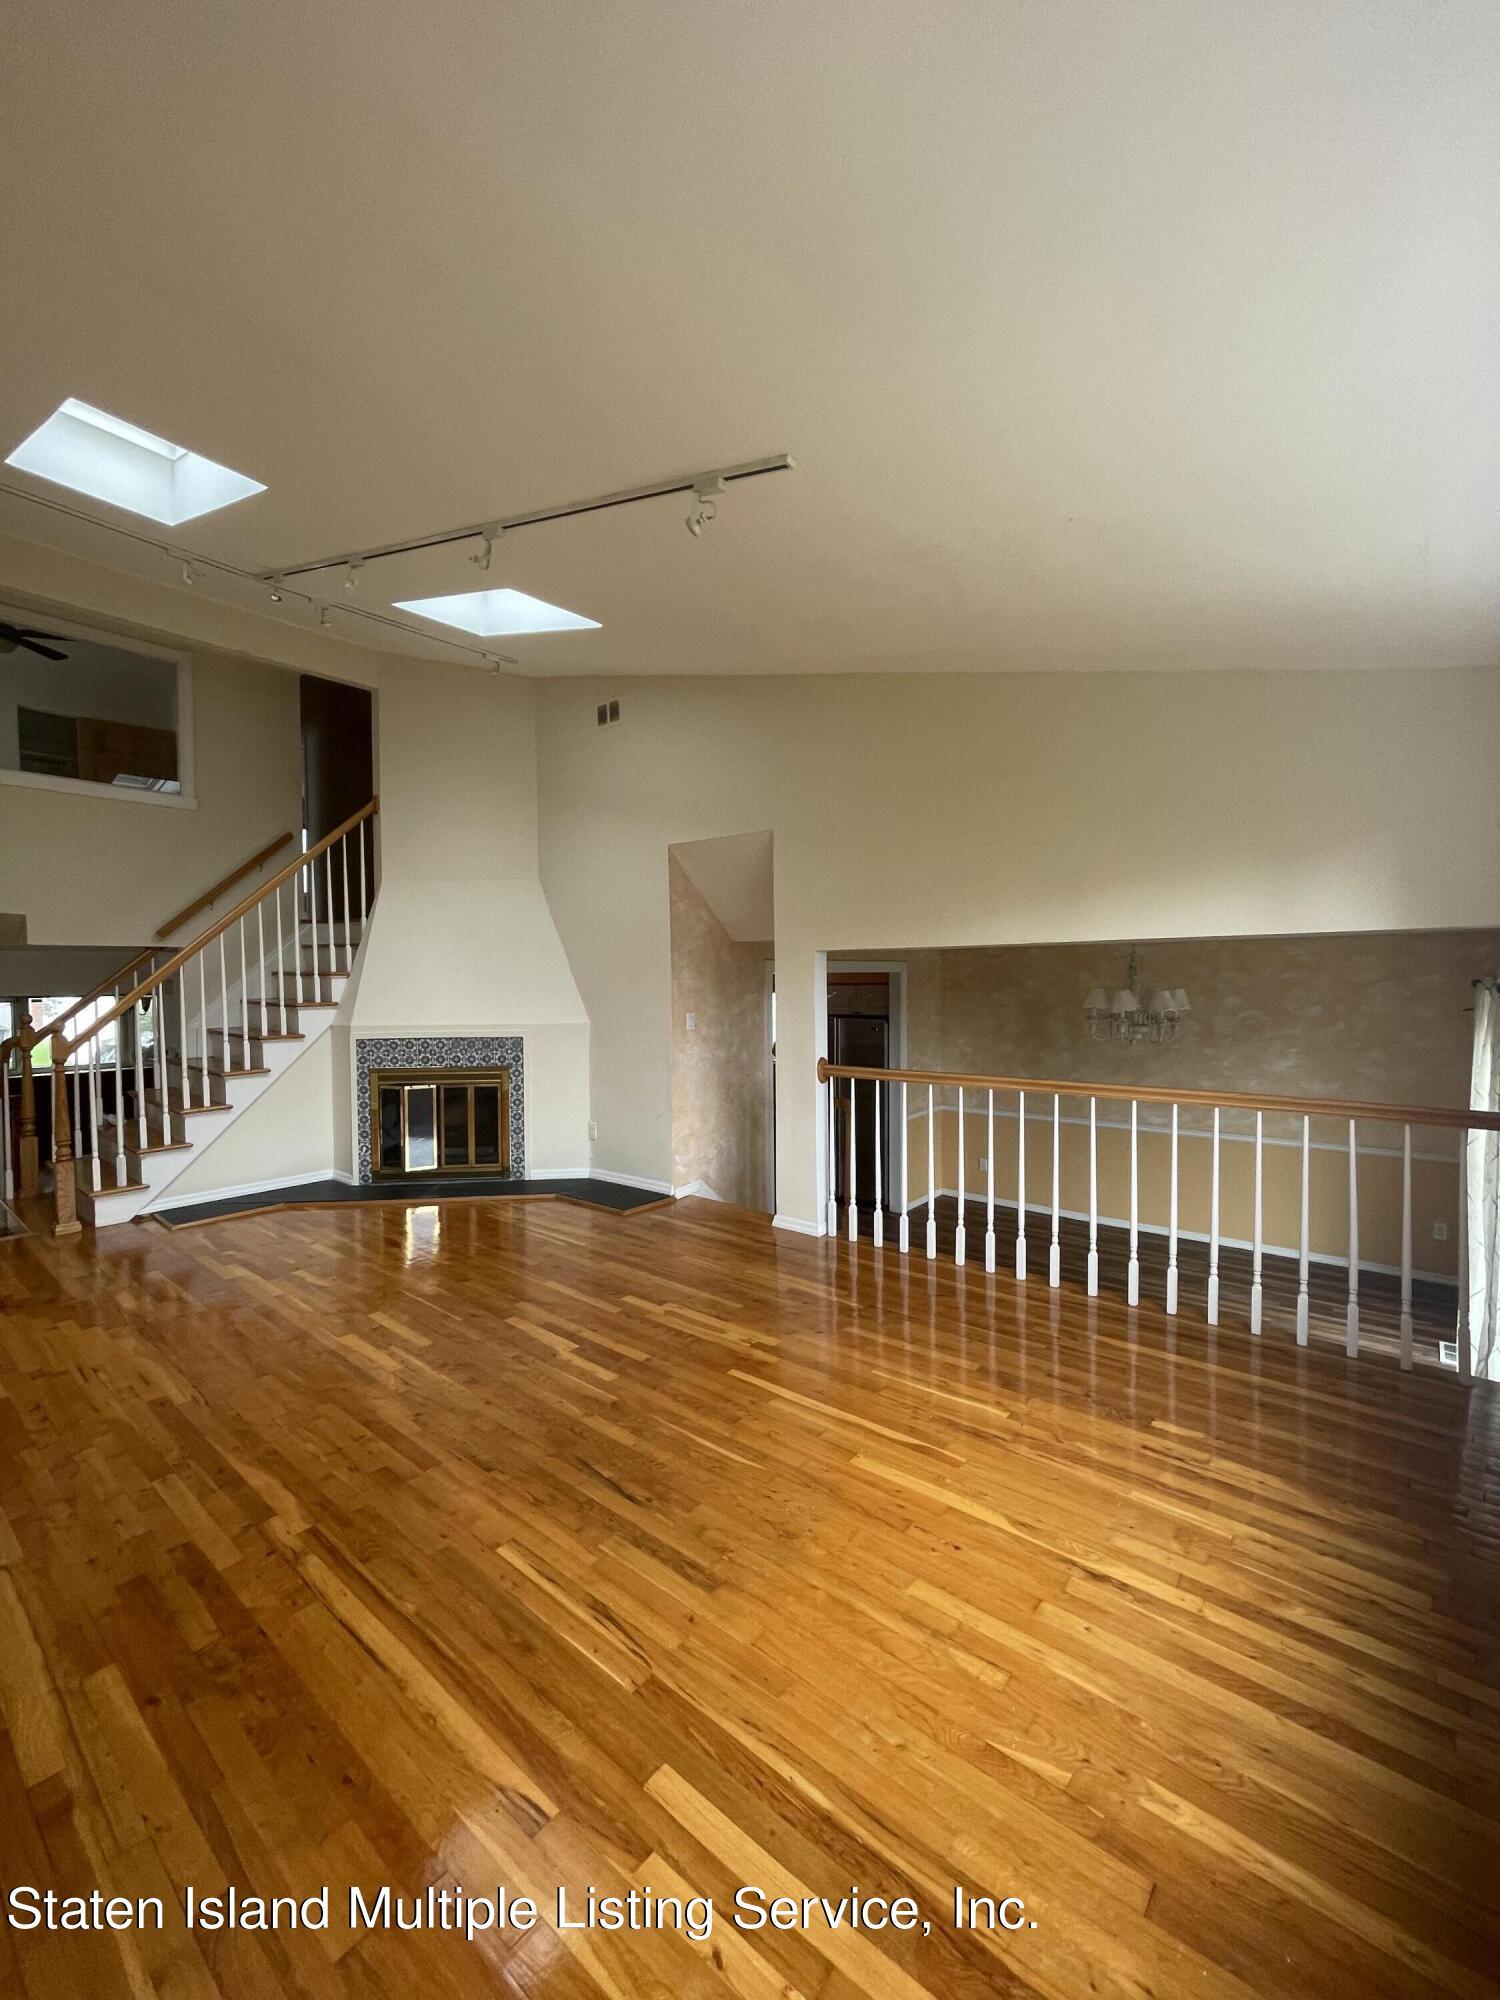 Single Family - Detached 484 Mountainview Avenue  Staten Island, NY 10314, MLS-1147175-44